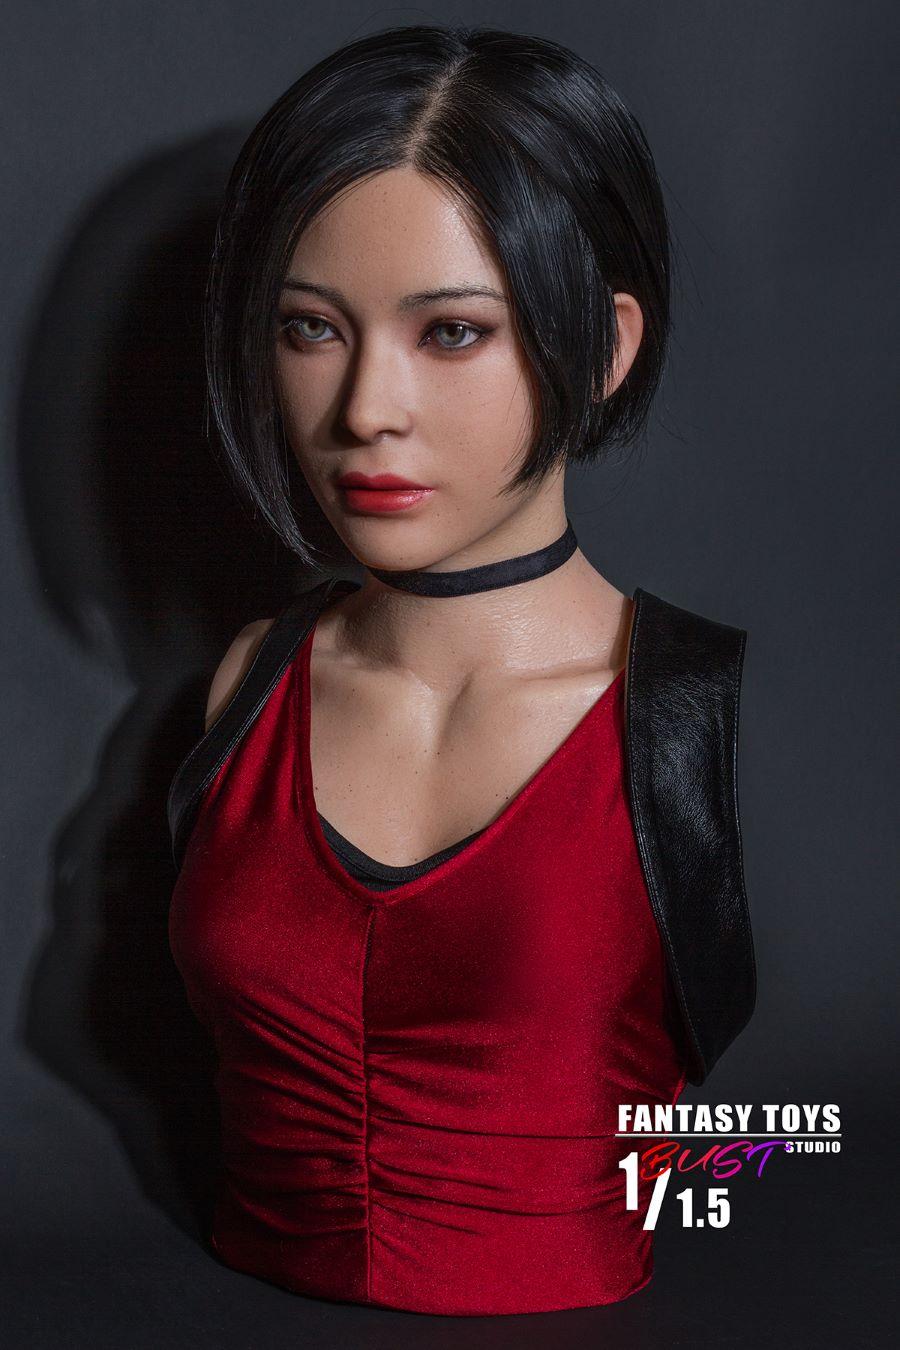 Fantasy Toys анонсировала бюст Ады Вонг из Resident Evil 2 Remake